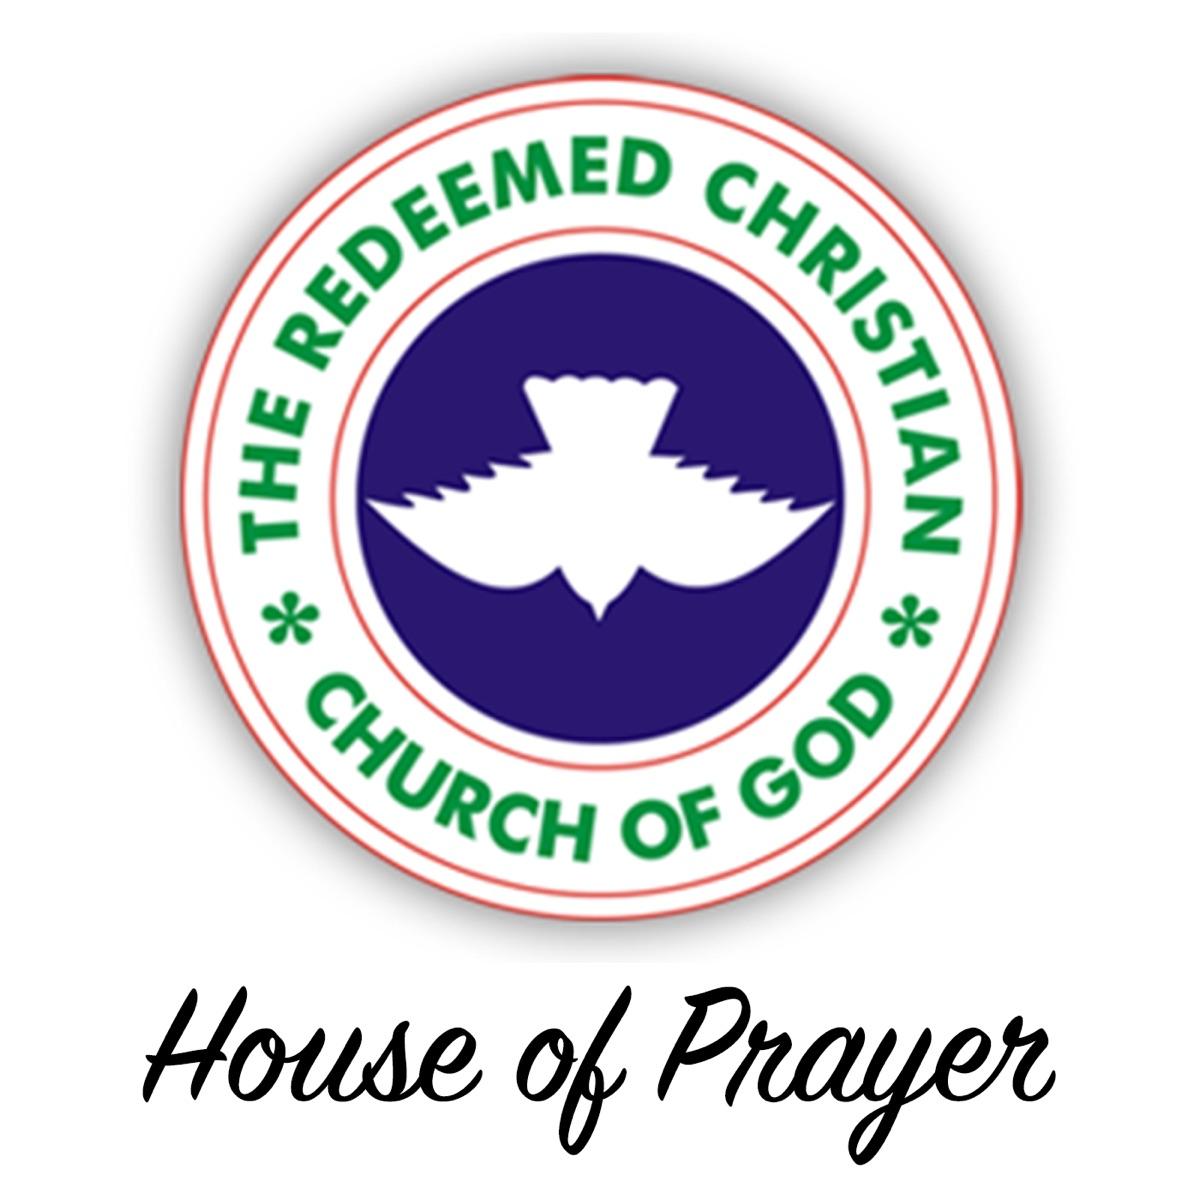 RCCG House of Prayer